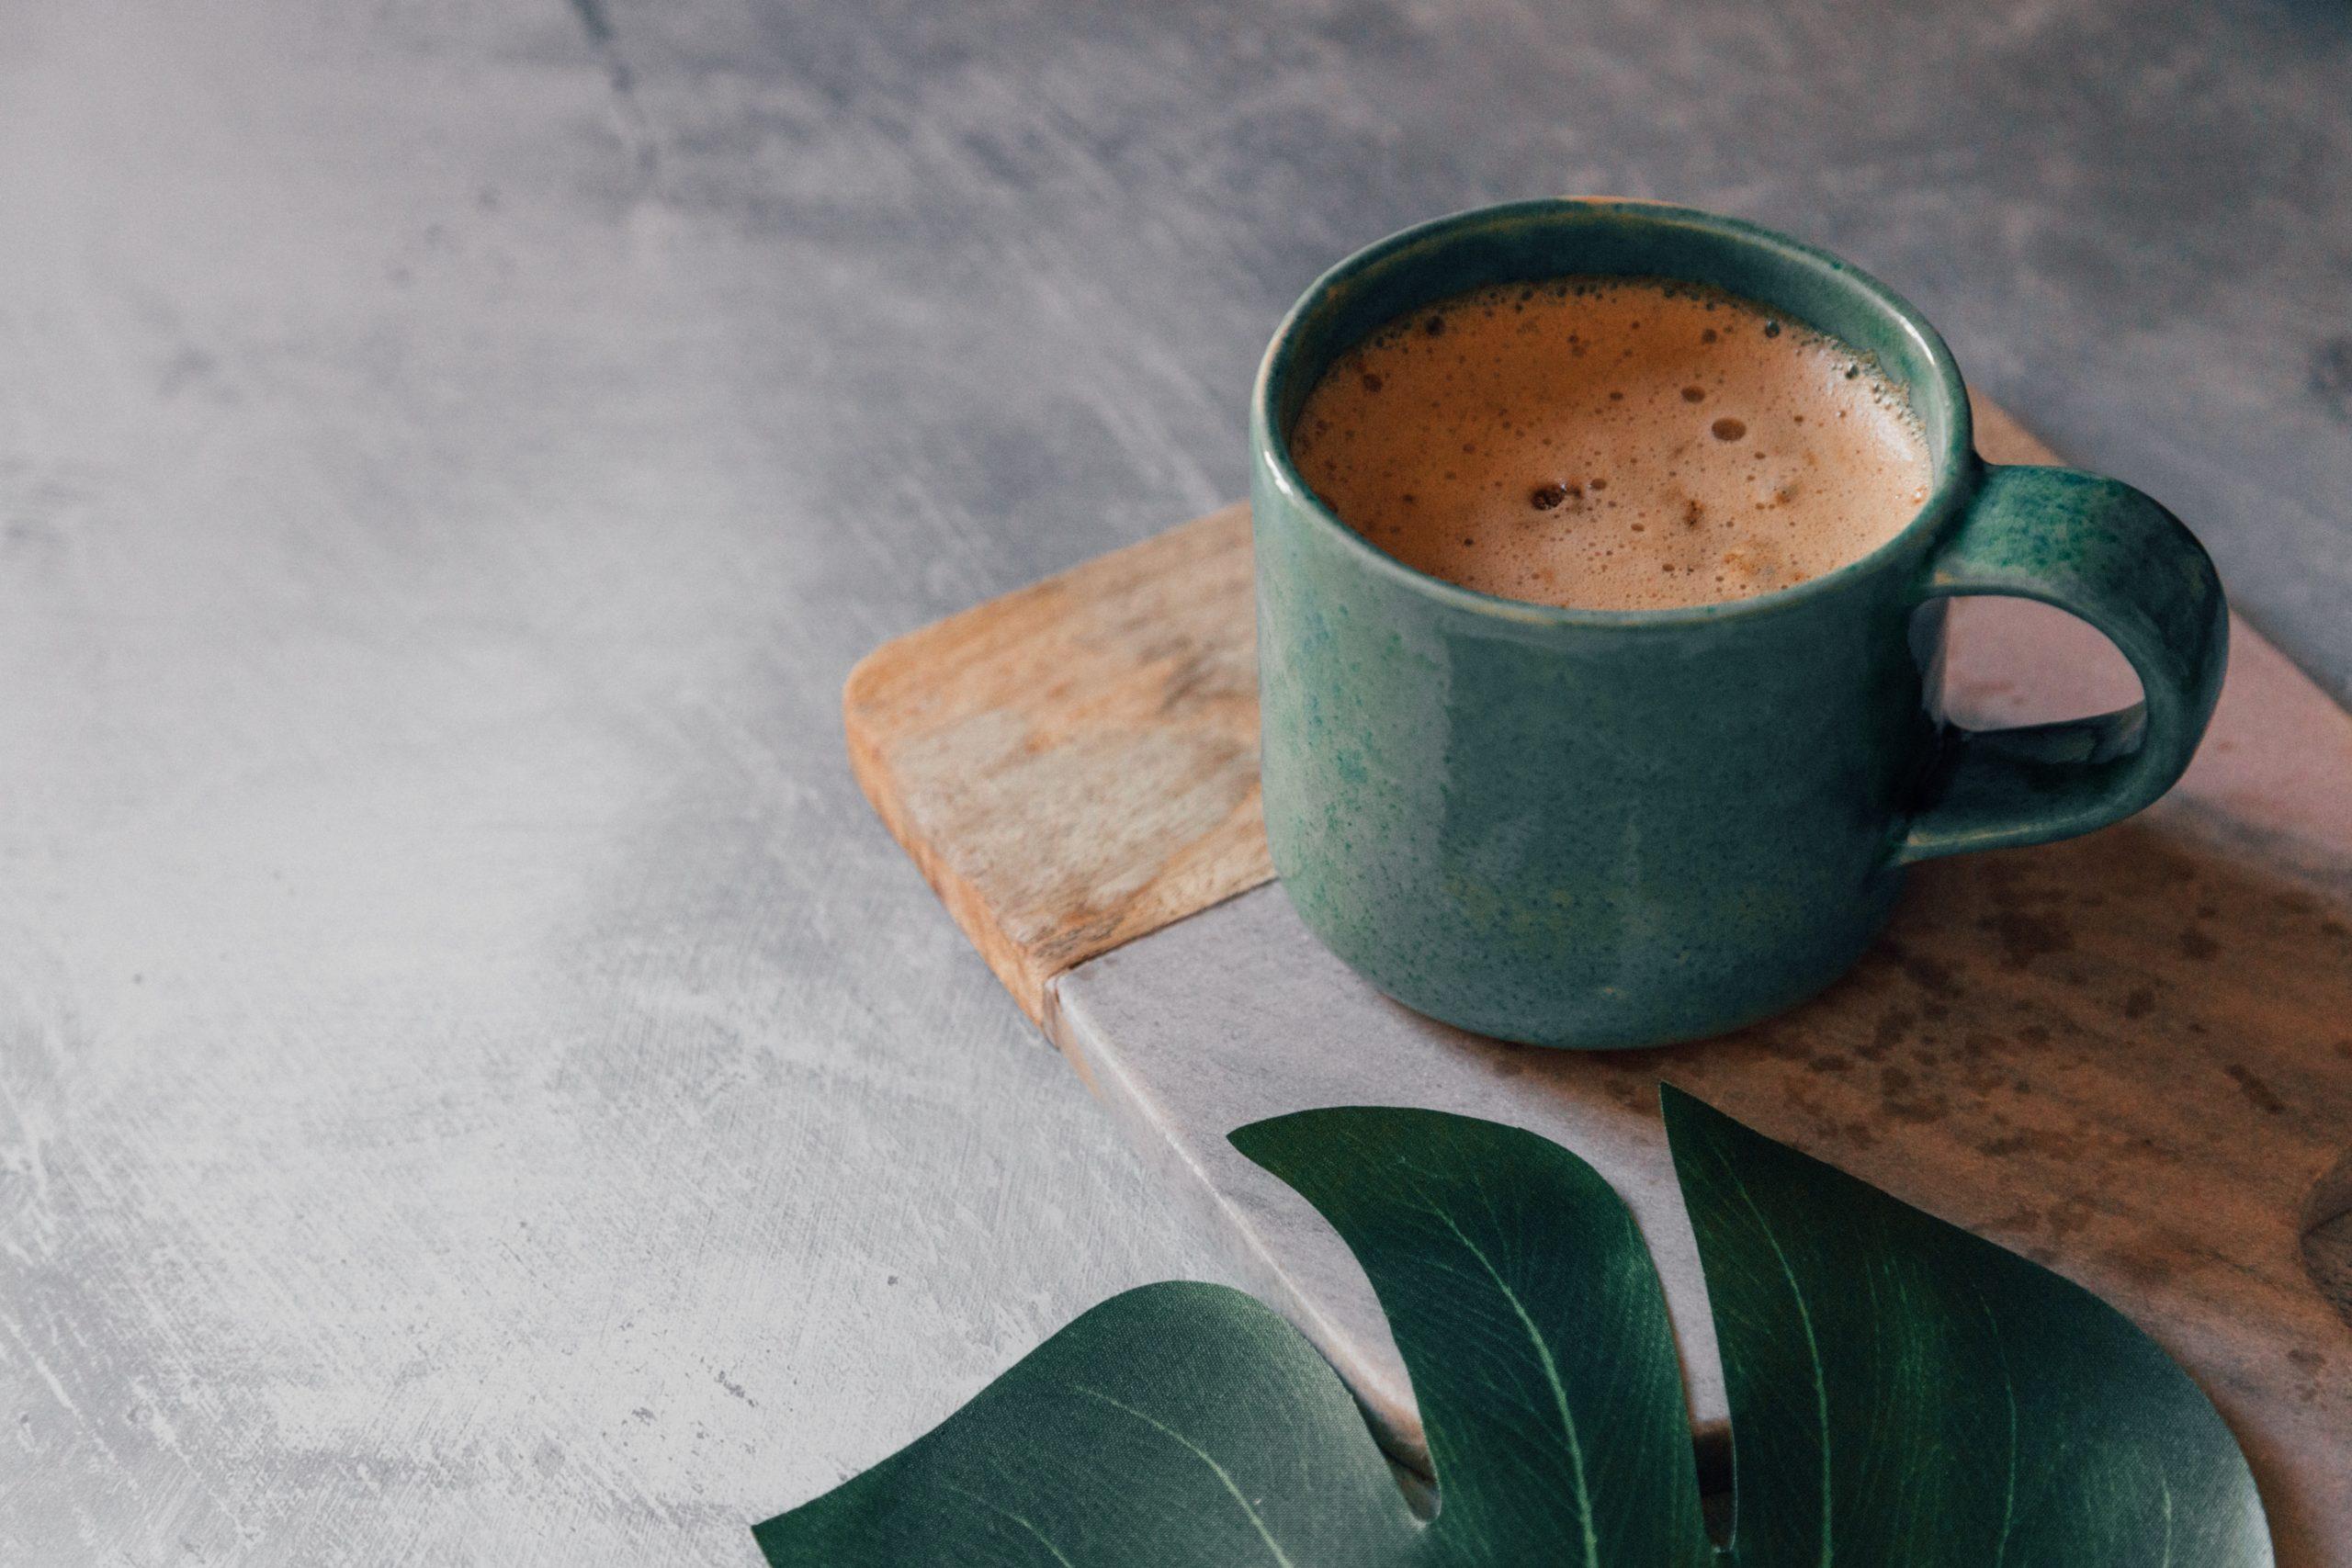 coffee acidic